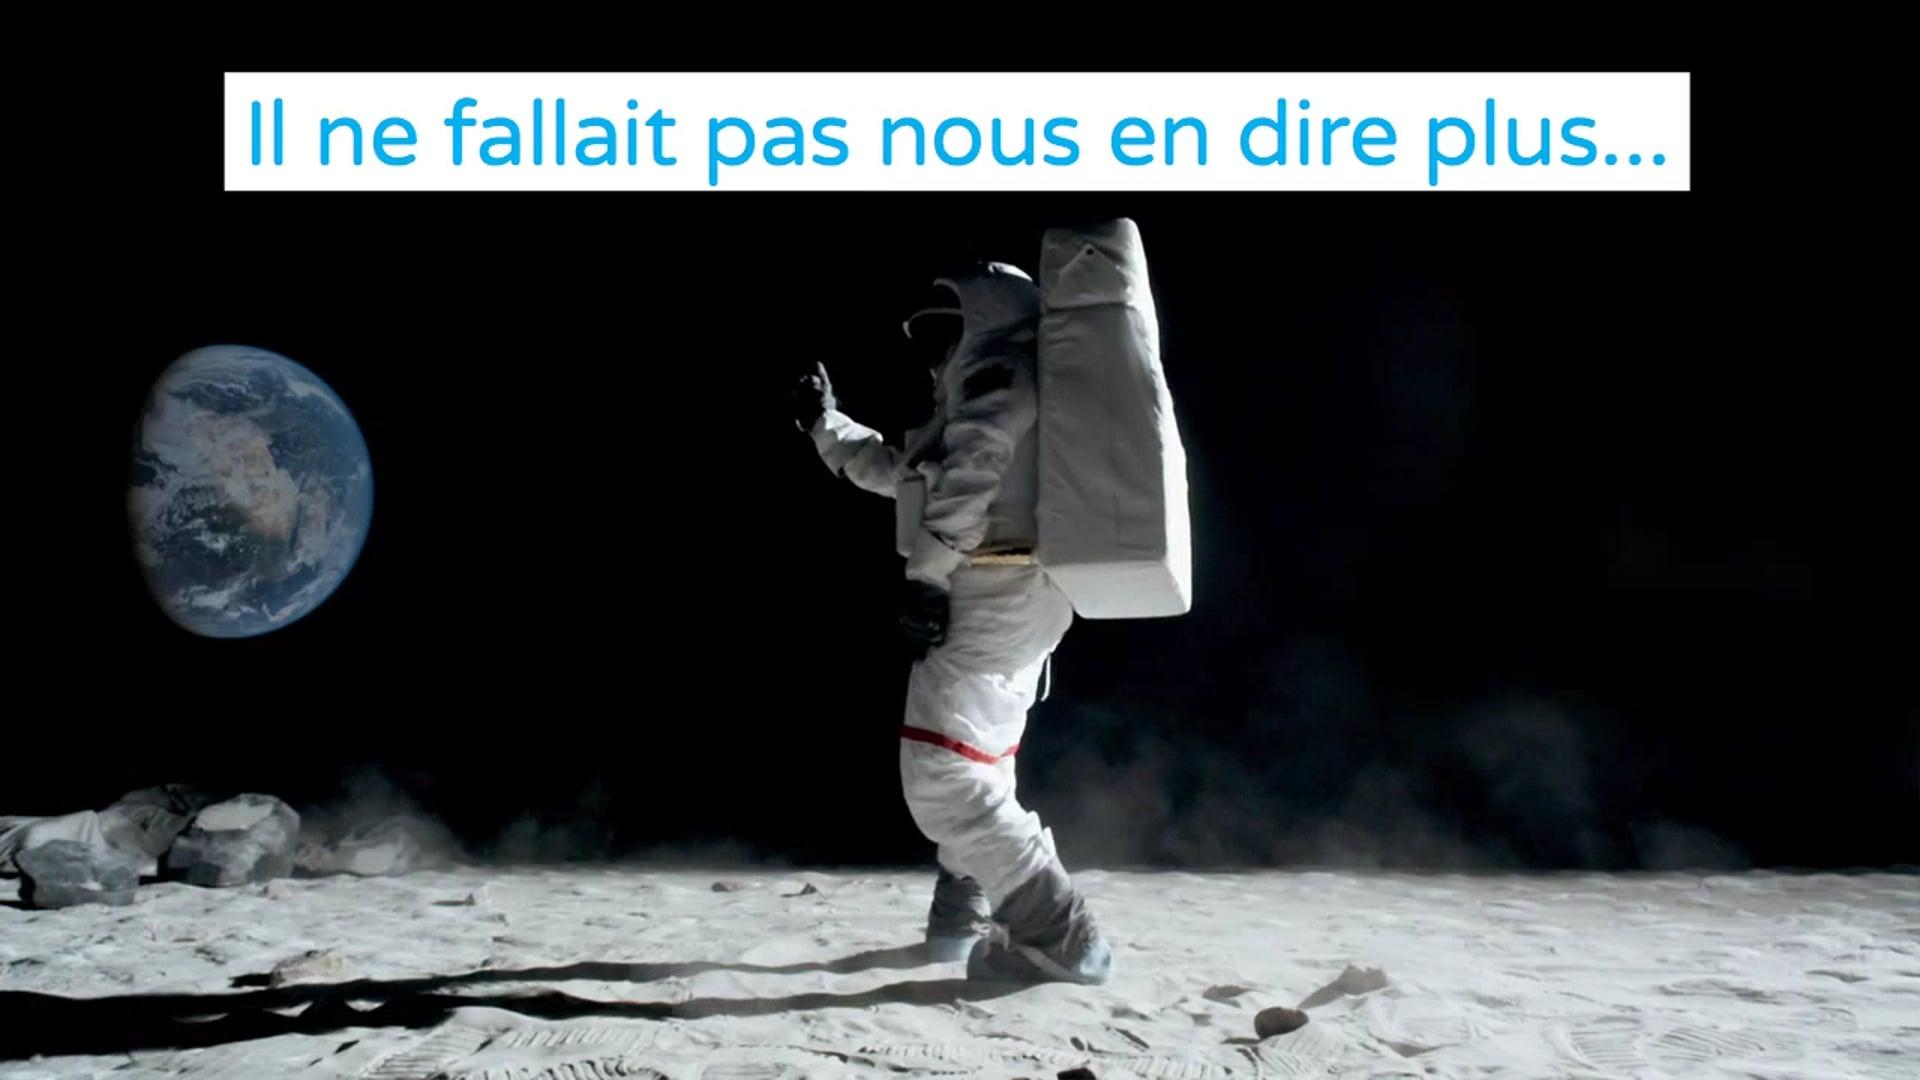 ekosystem_Video_Hommage_spaceX_falcon_heavy_recrutement